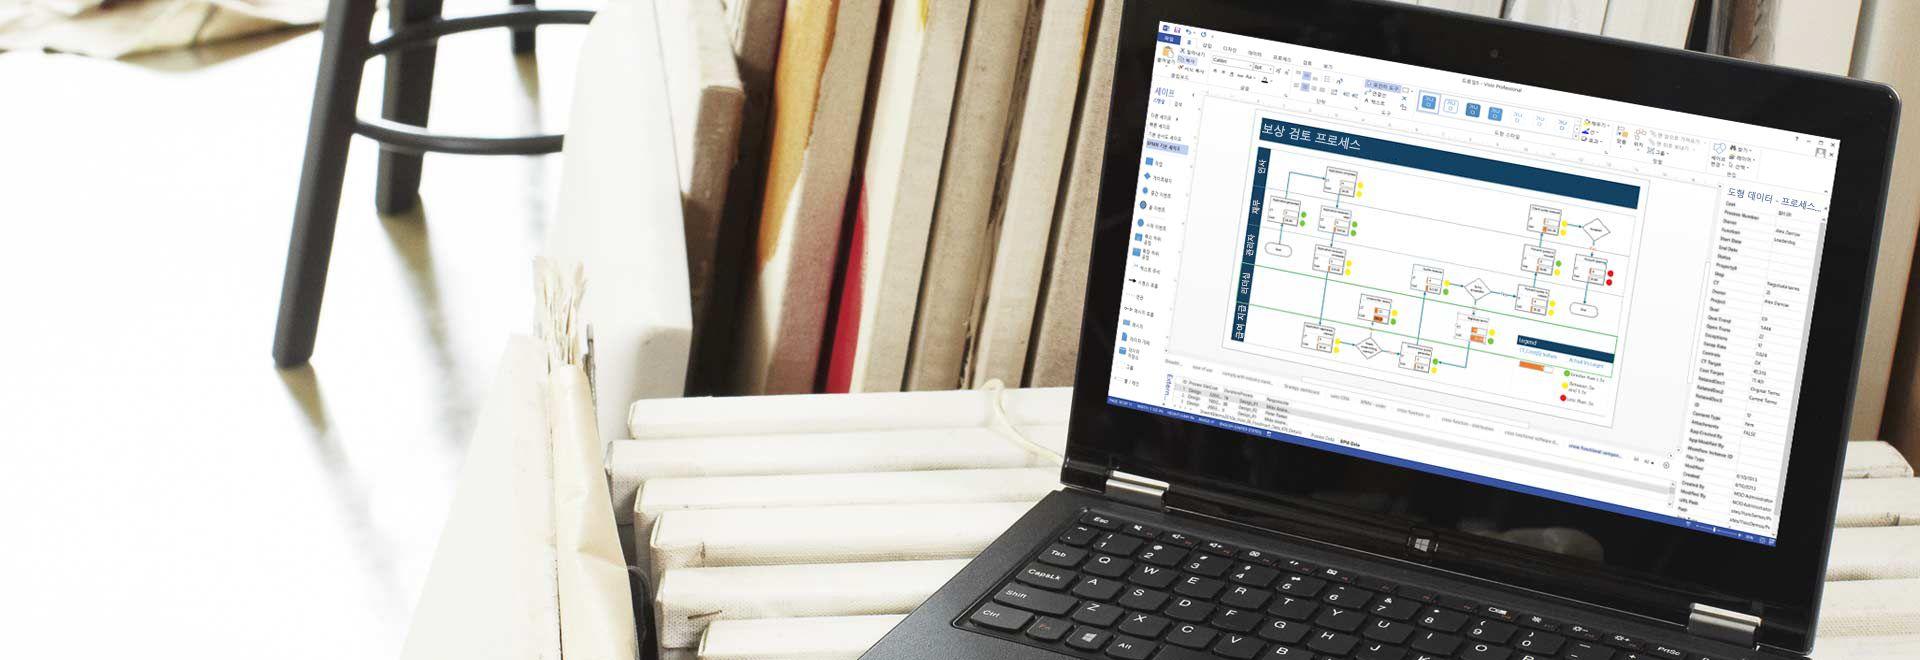 Visio Pro for Office 365의 프로세스 작업 흐름 다이어그램을 표시하는 노트북